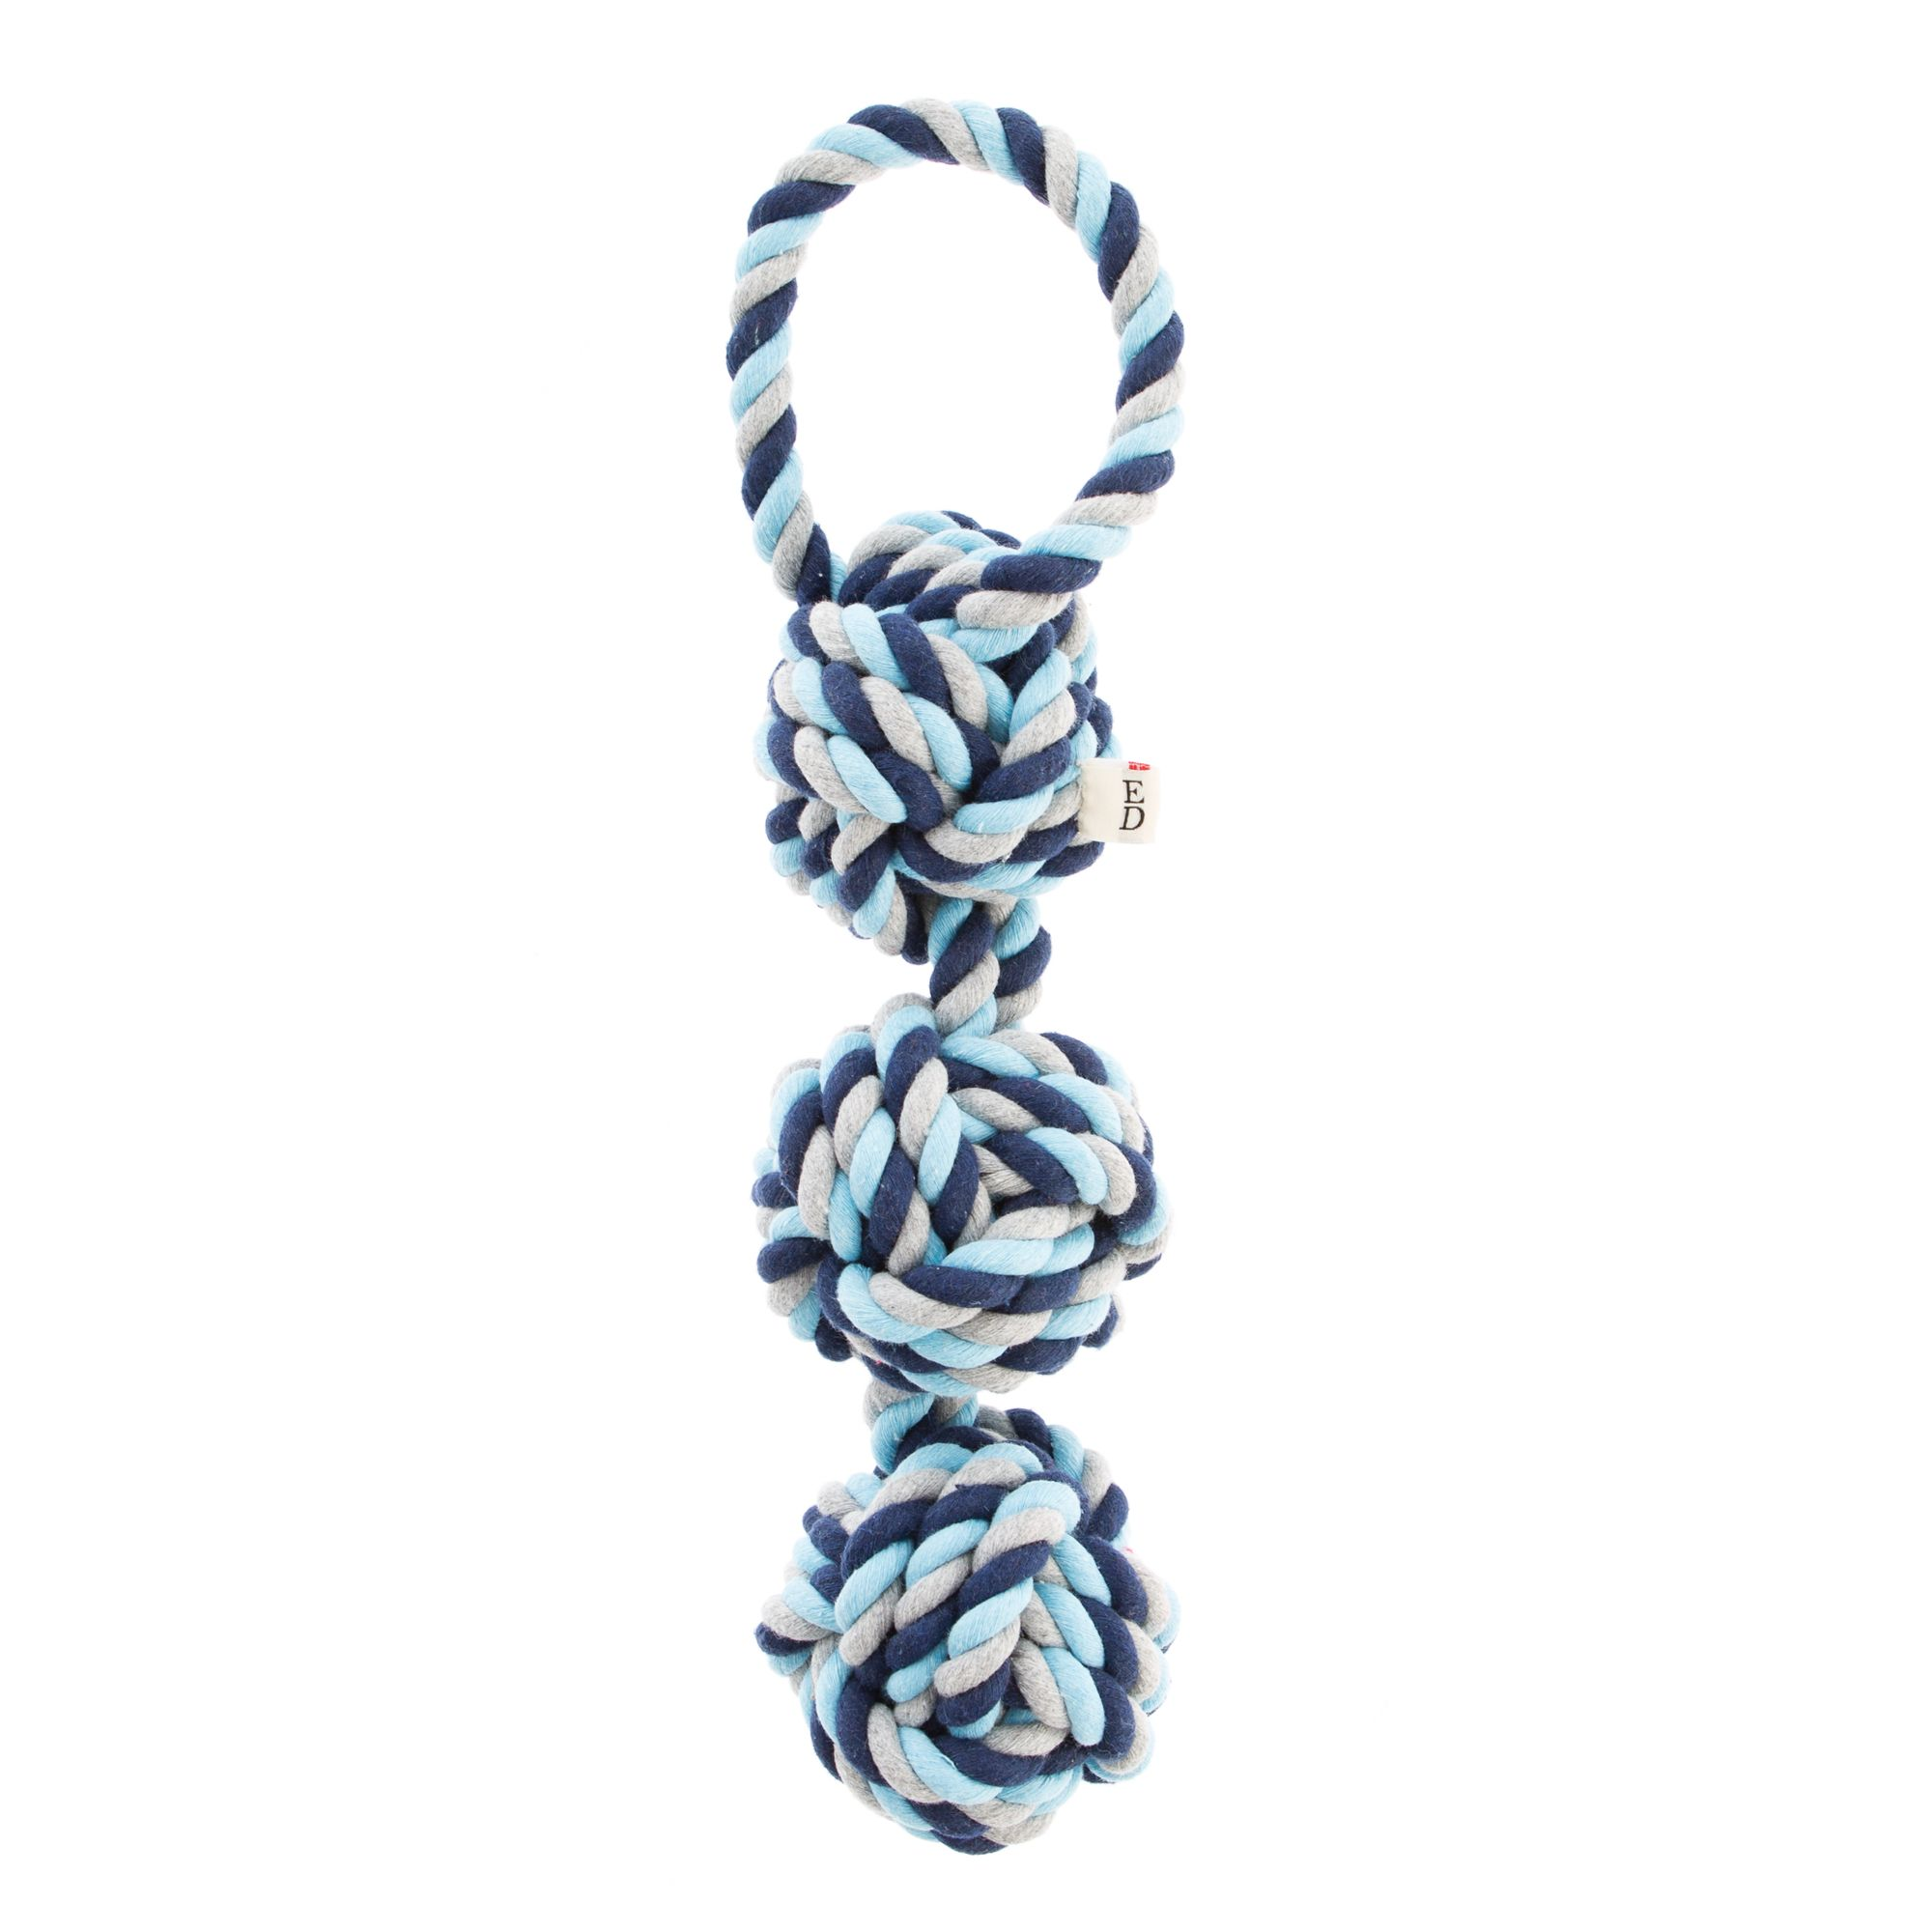 Ed Ellen Degeneres 3 Knot Dog Toy Rope